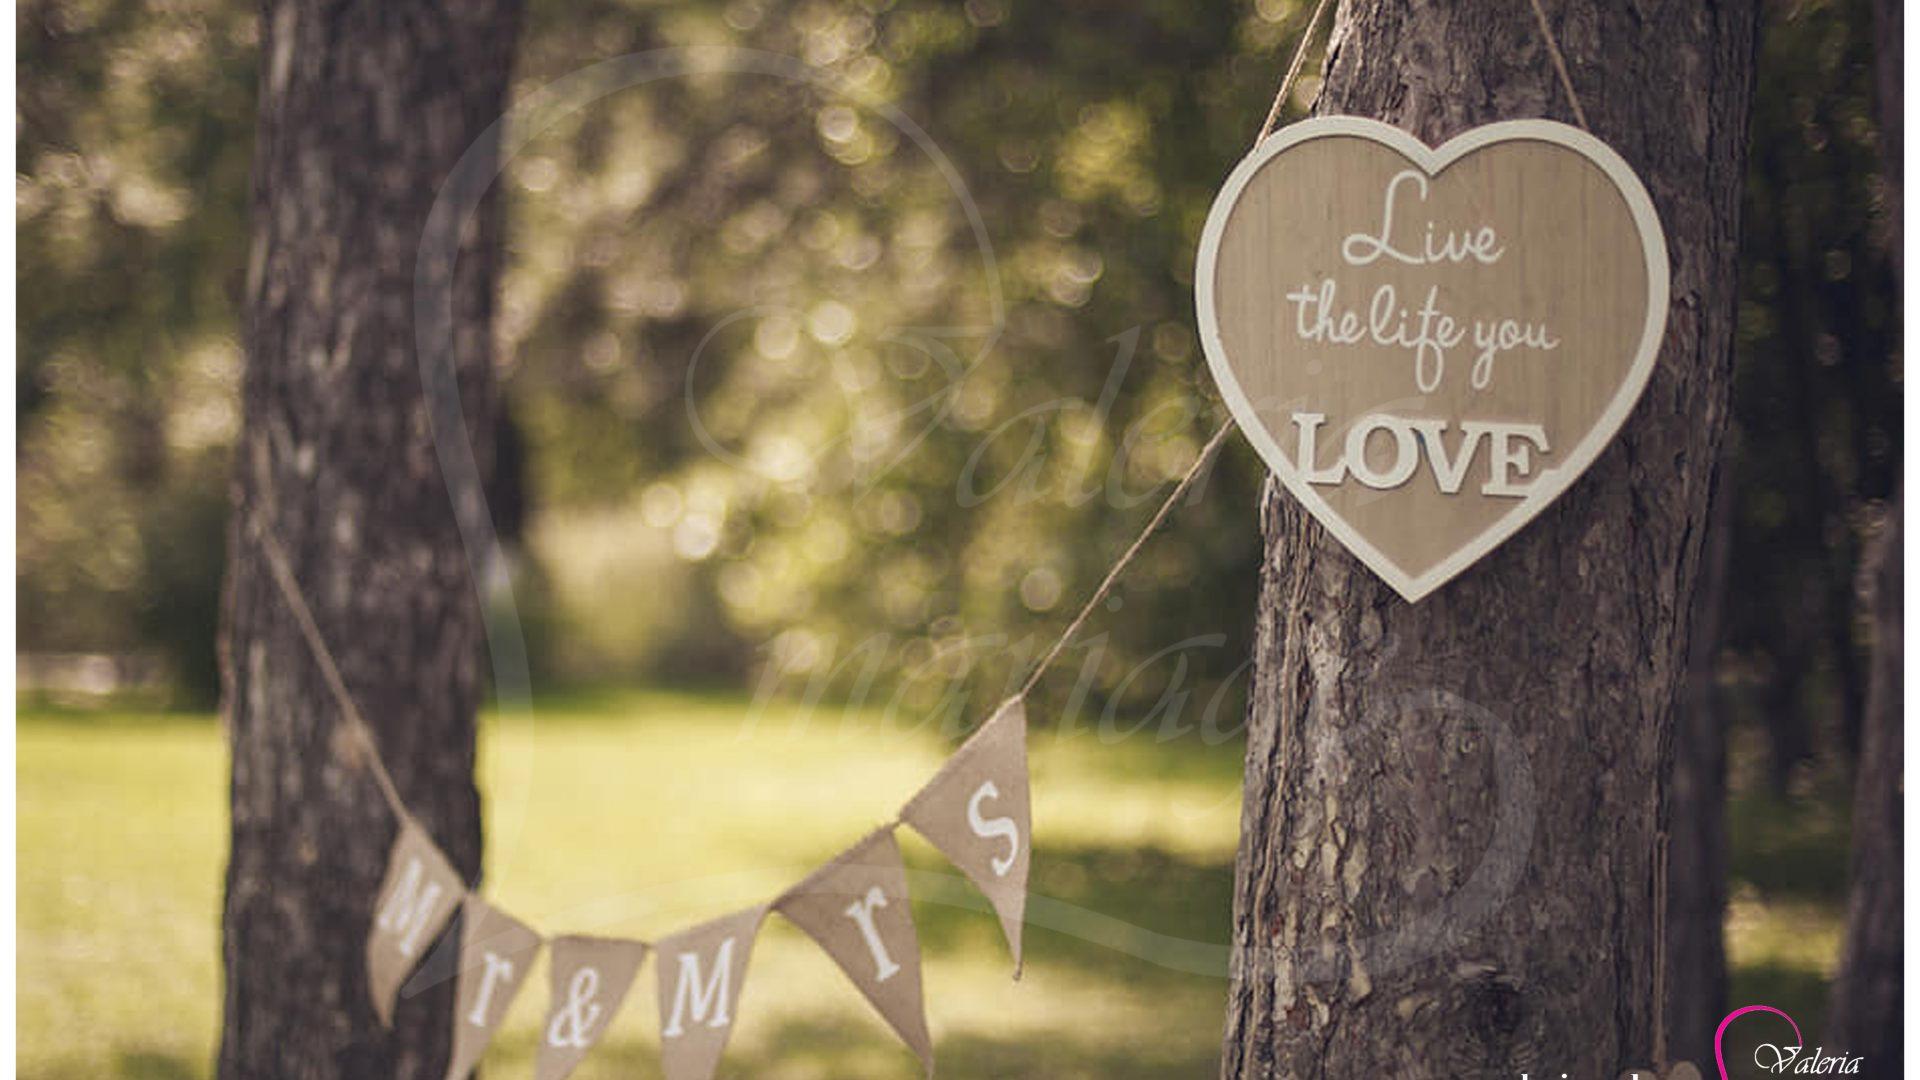 Inregistrarea casatoriei sub cerul liber Agentia Valeria Mariage 069787665 www.valeria (8)